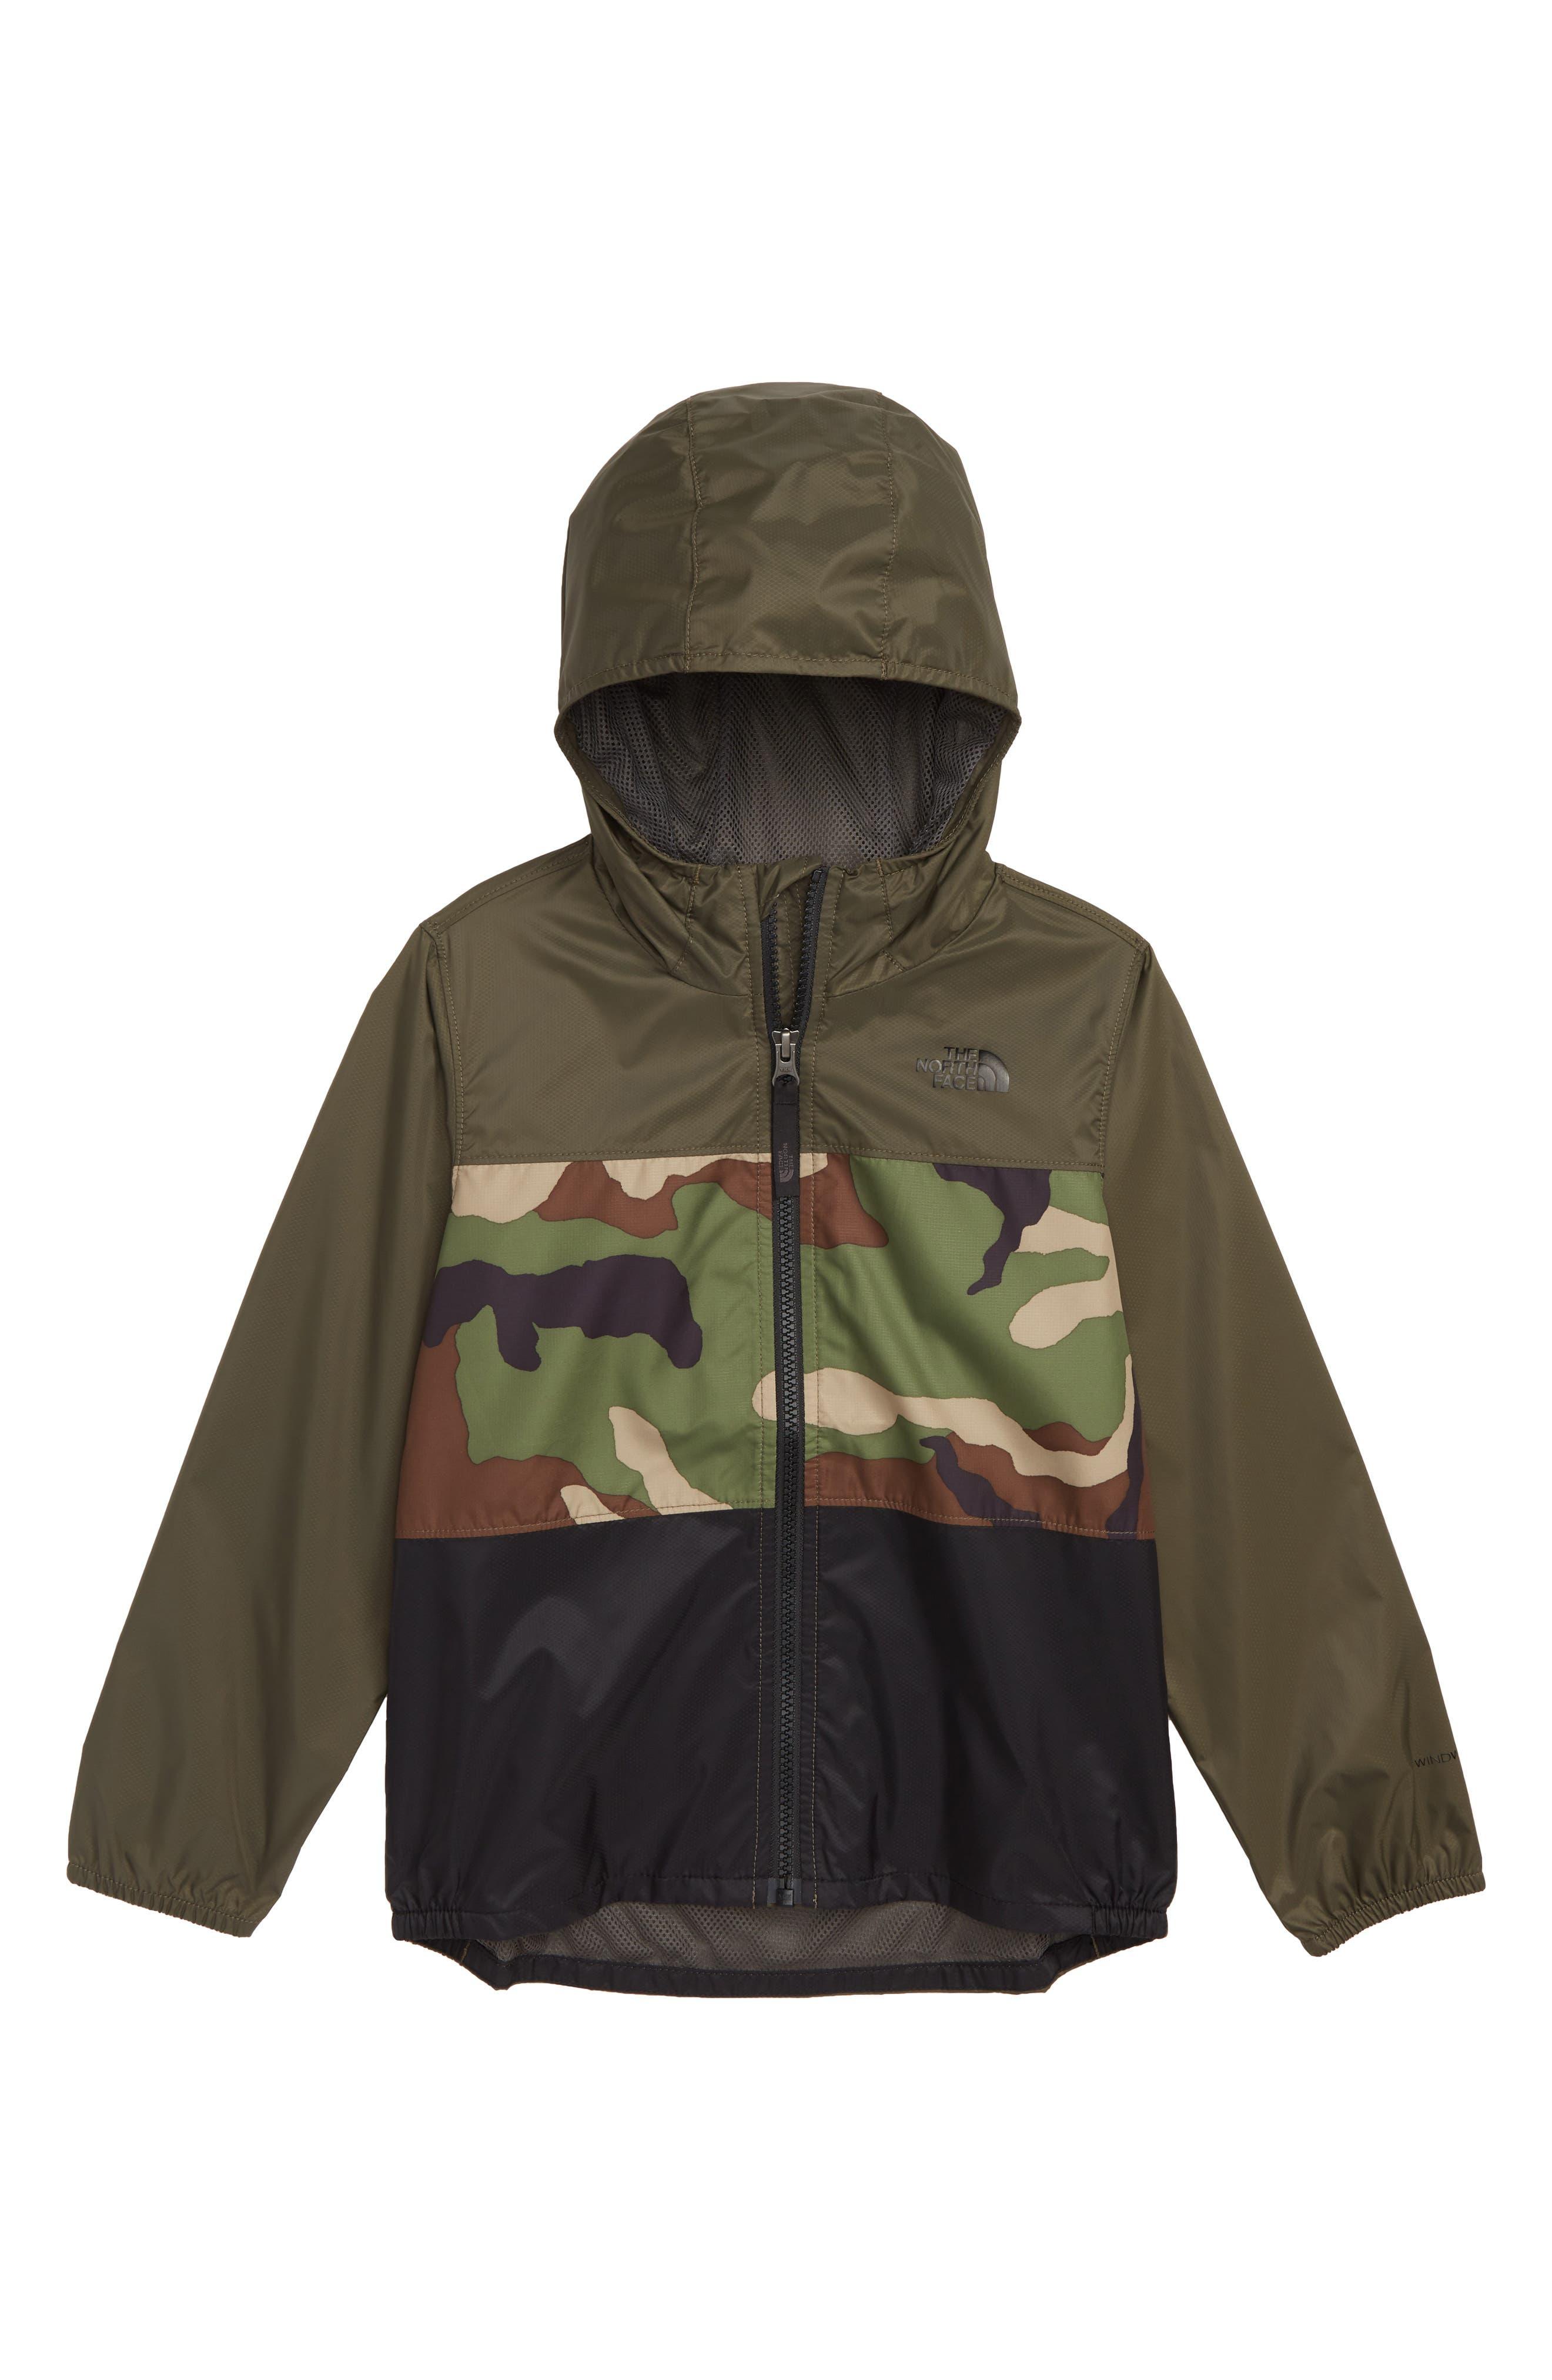 THE NORTH FACE, Flurry Hooded Windbreaker Jacket, Main thumbnail 1, color, TERRARIUM GREEN WOODLAND CAMO